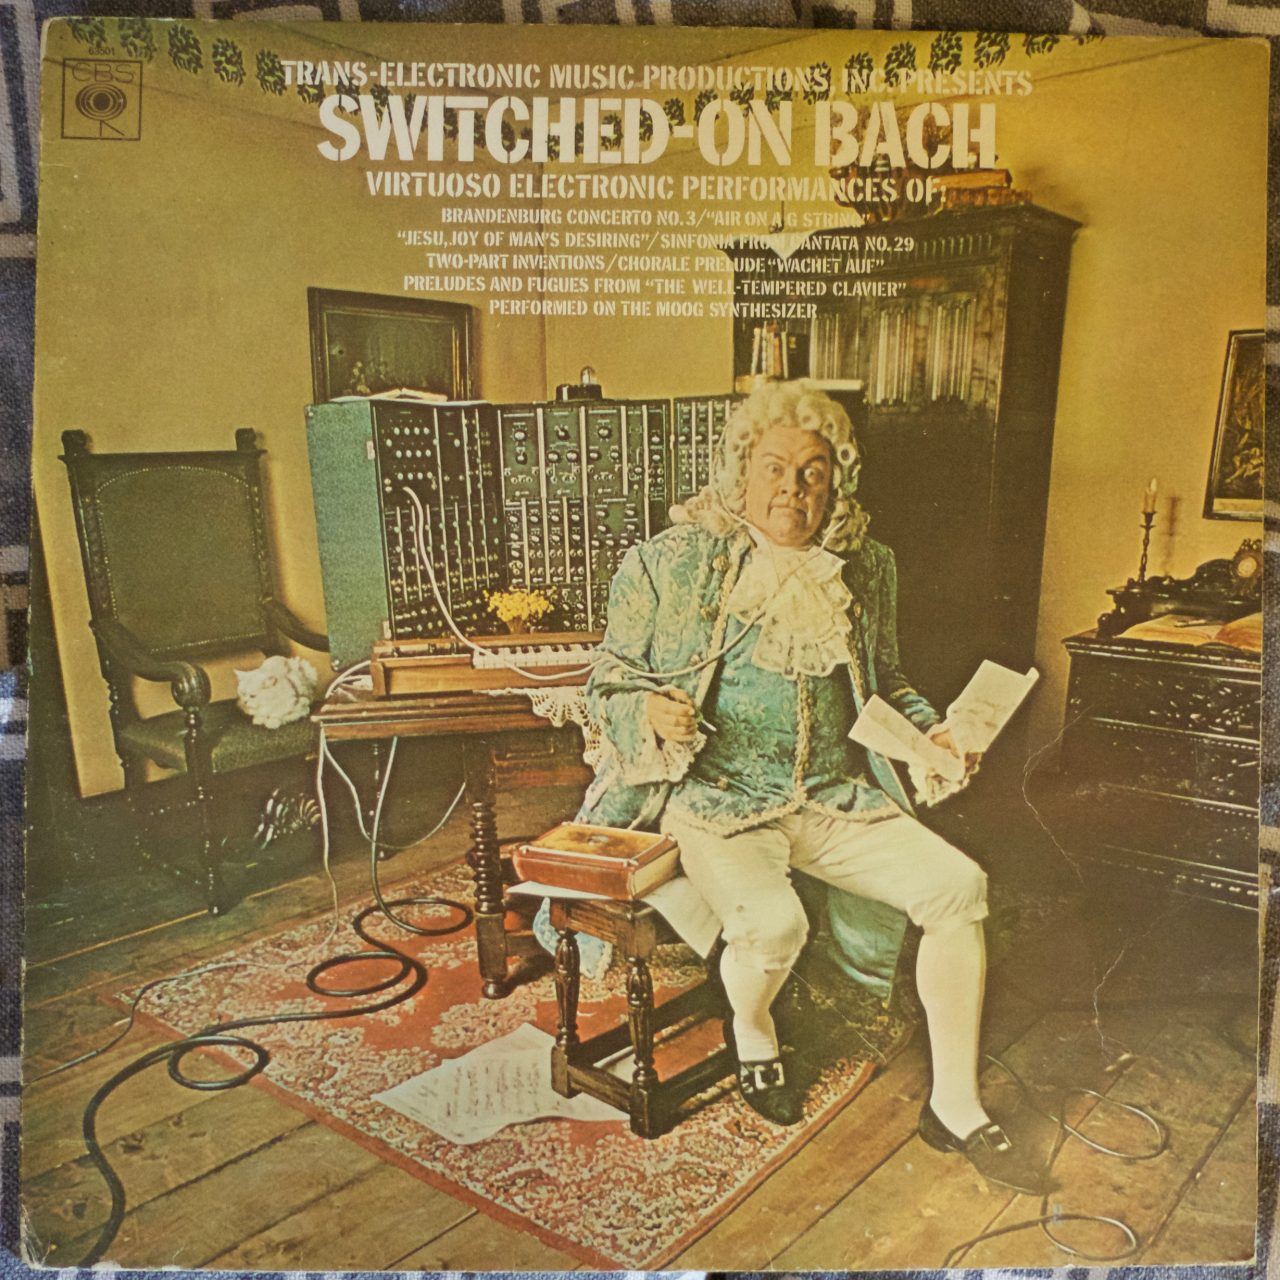 Pochette de l'album de Walter Carlos / Switched-on Bach